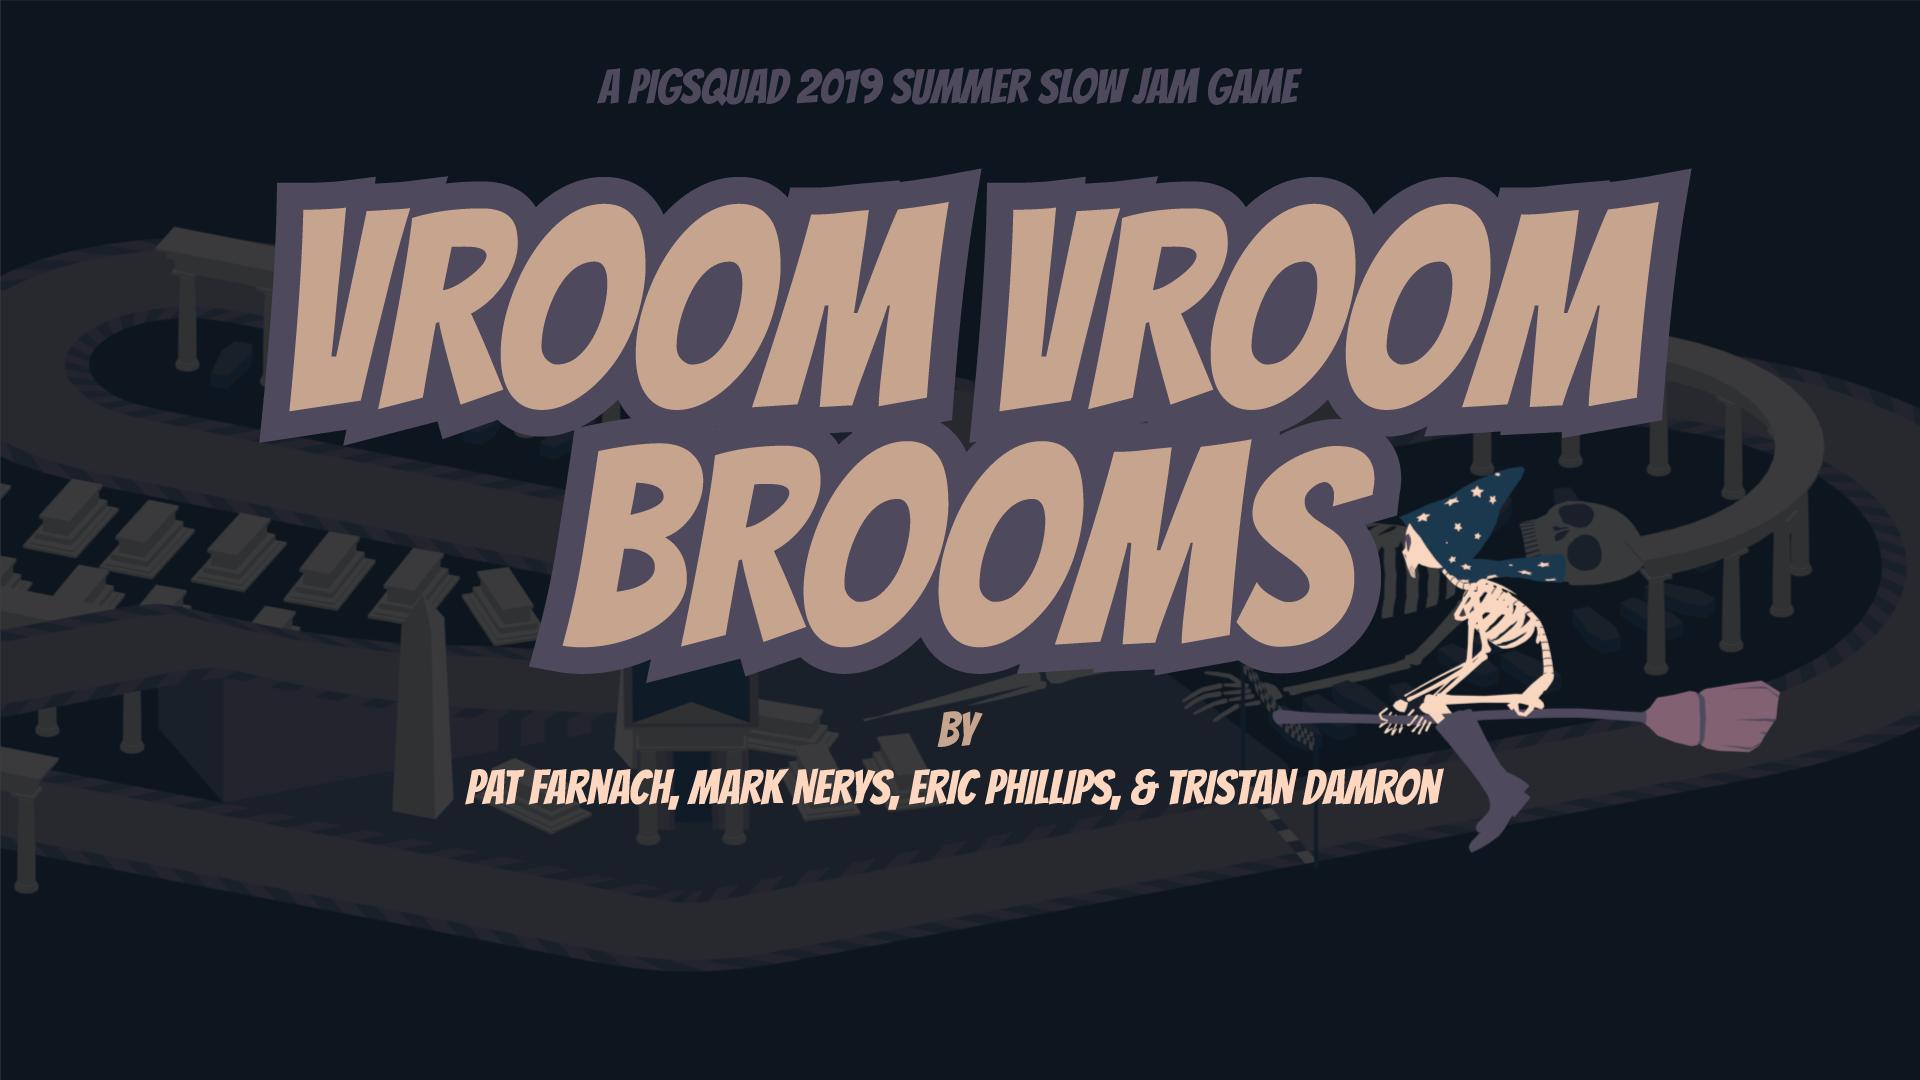 Vroom Vroom Brooms